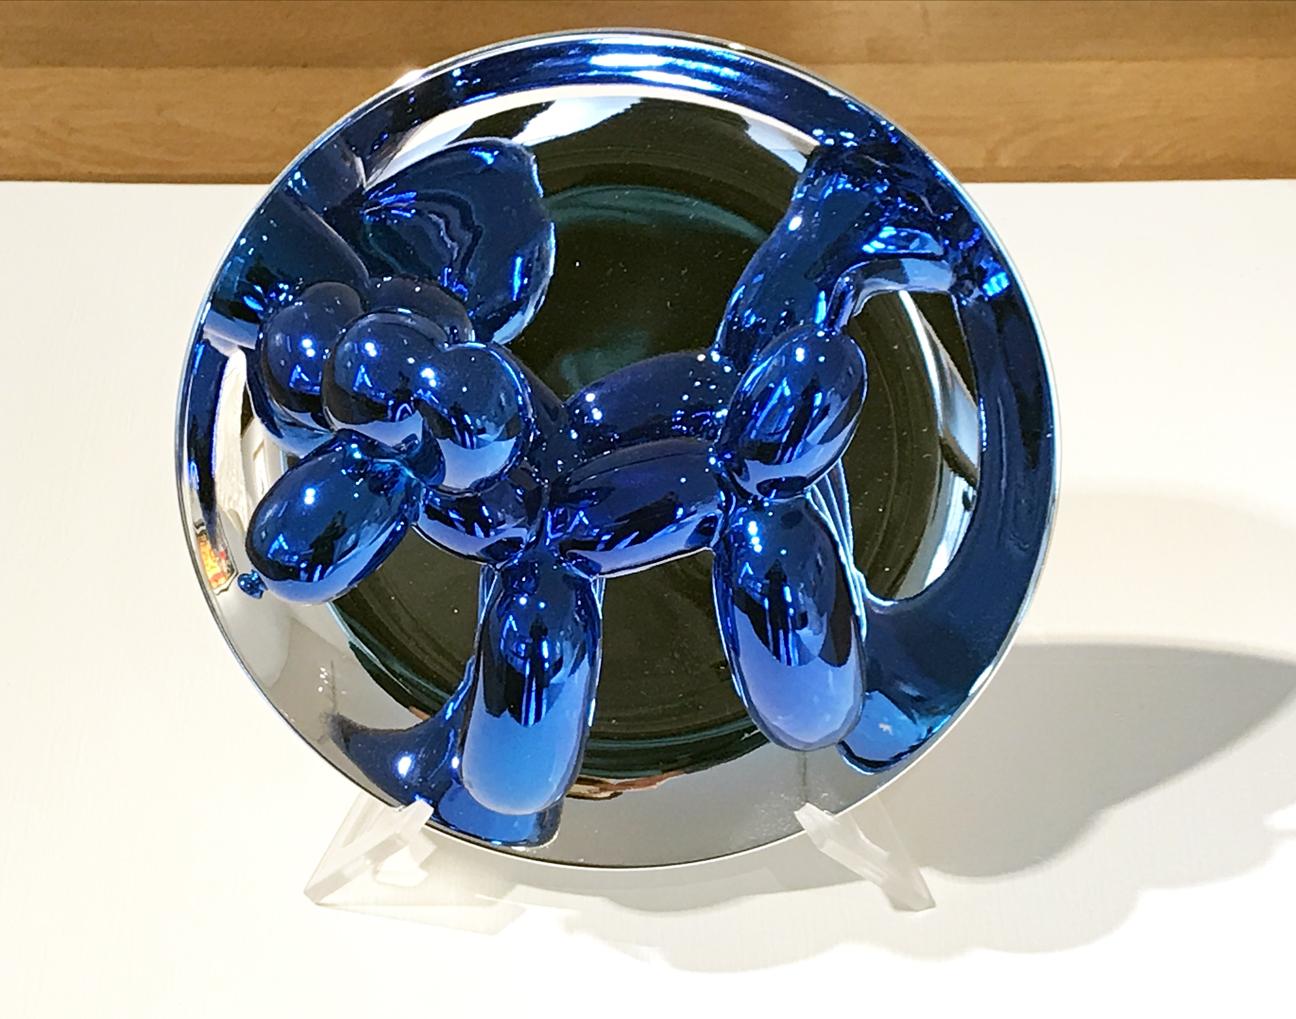 14.Jeff Koons. Balloon Dog Plate, 2002. Fine Porcelain, ed. 2002/2300, 10 ½ x 10 ½ x 5 in.